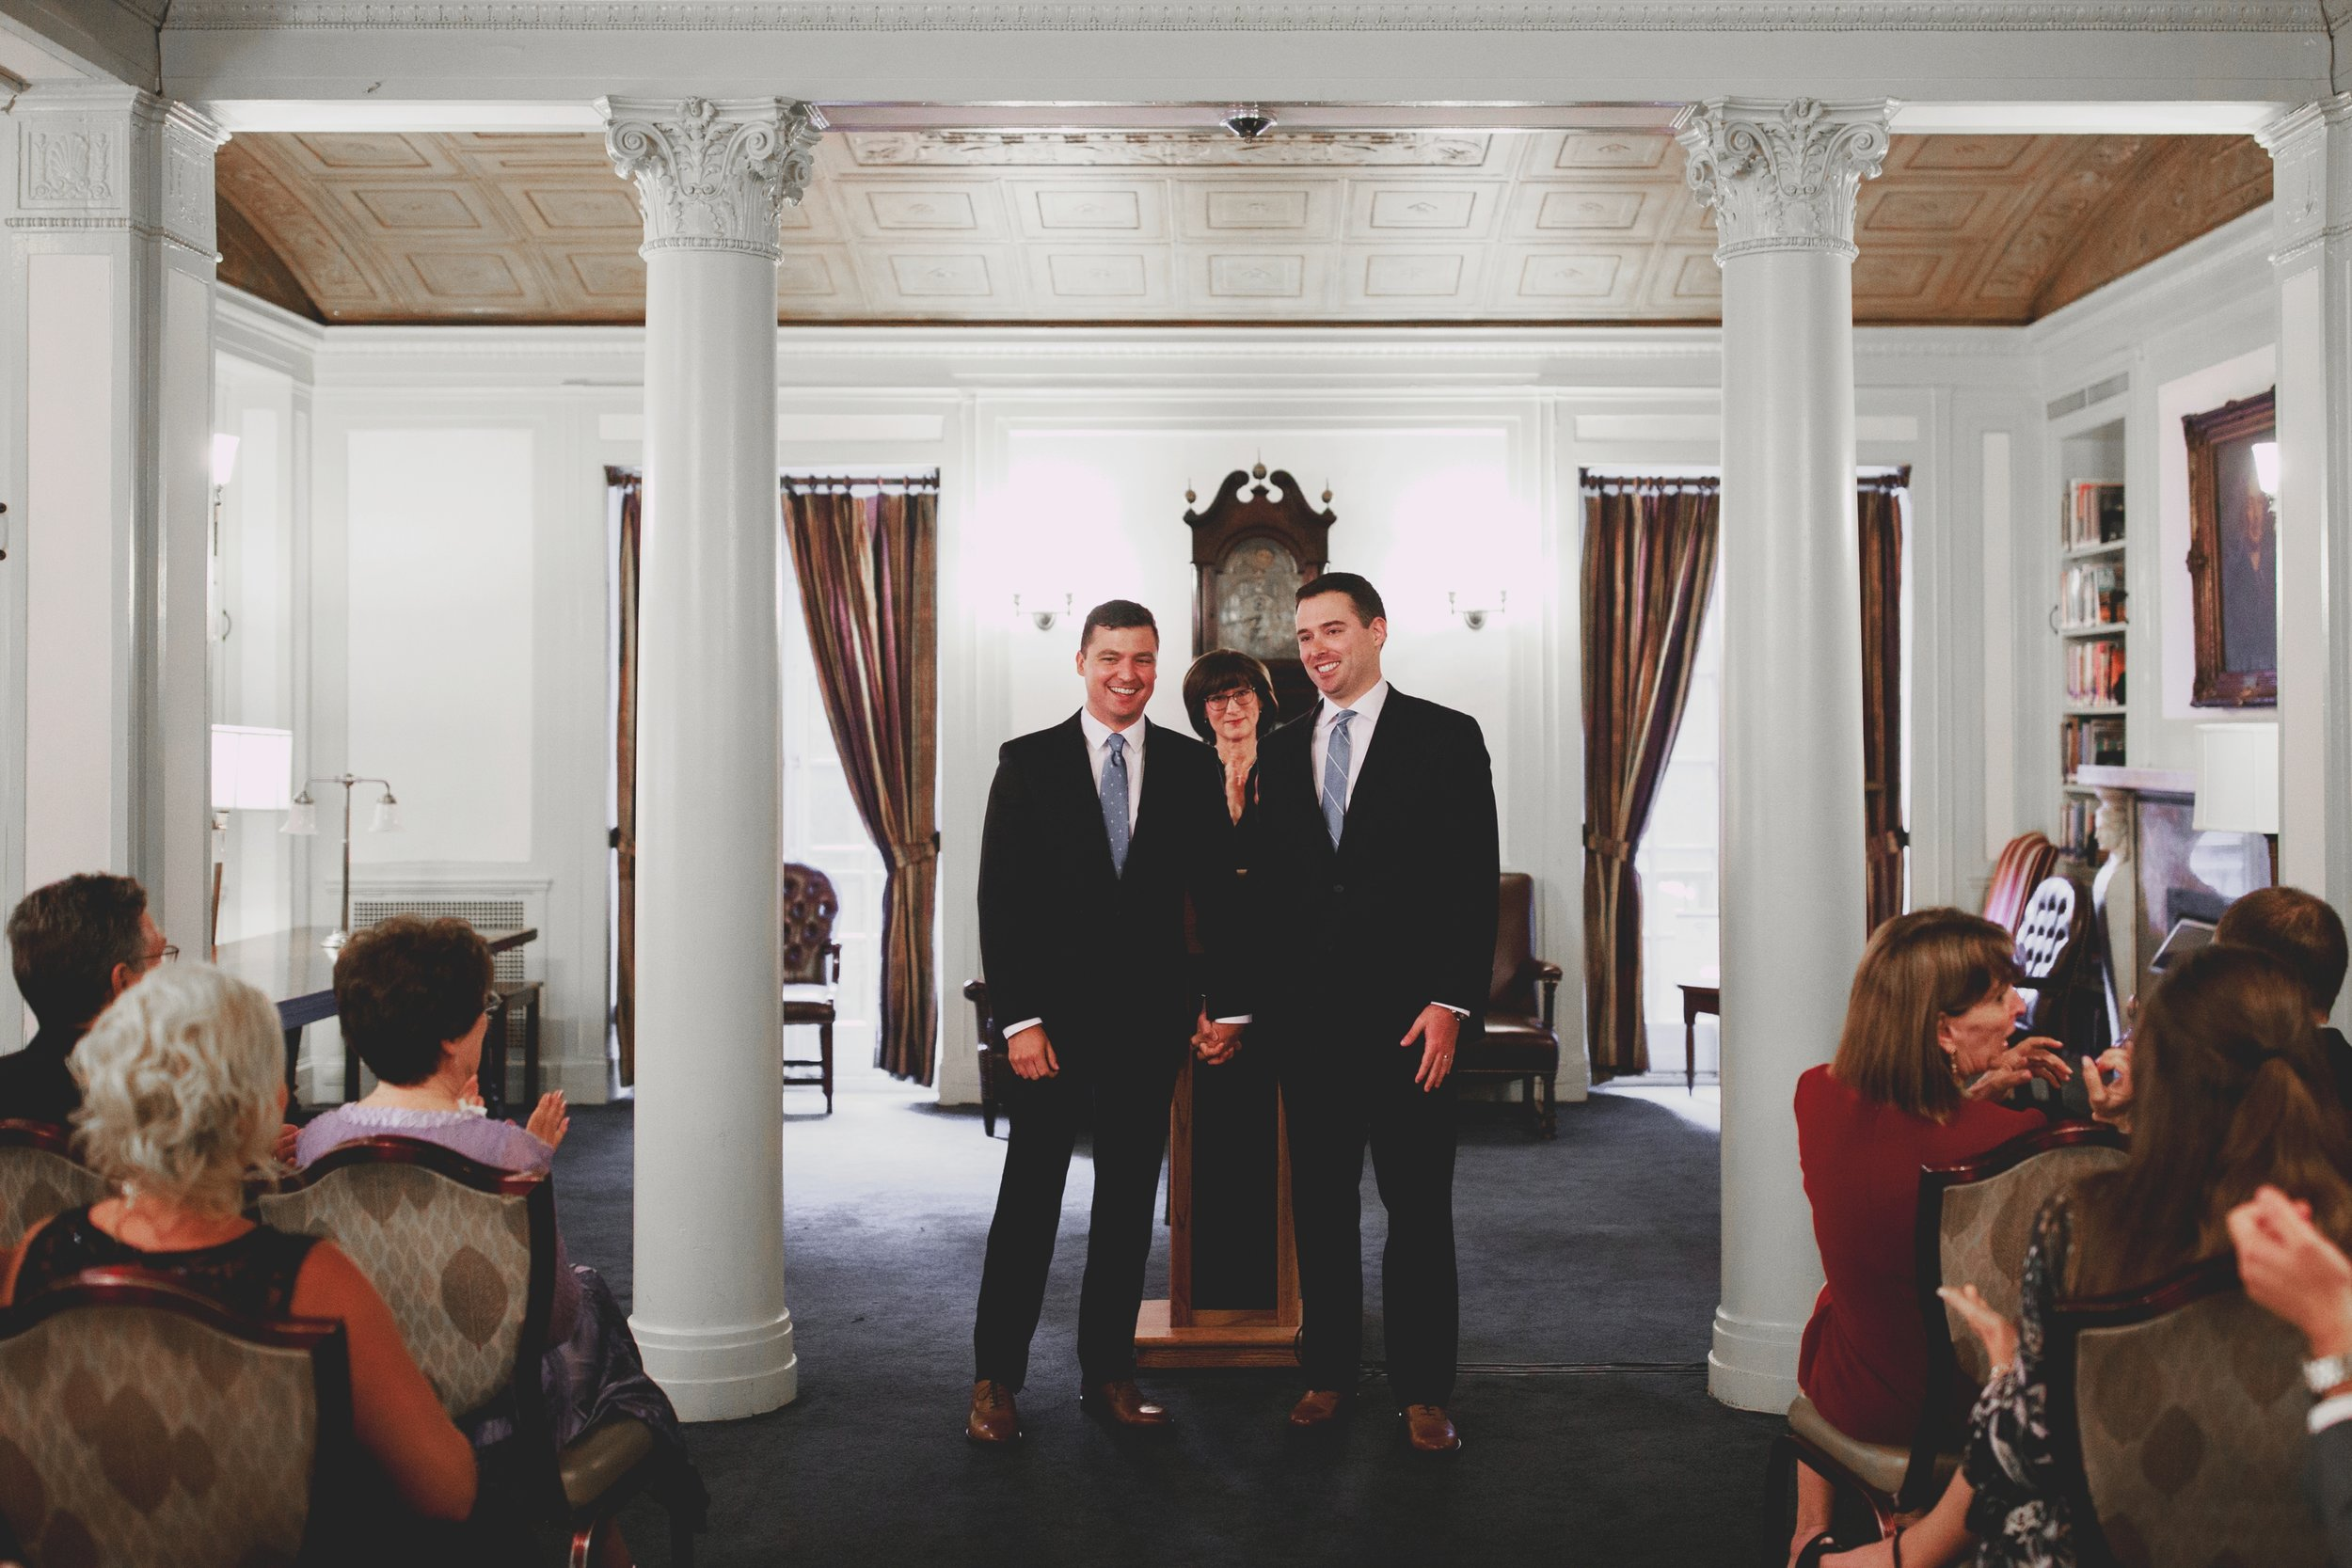 amanda_vanvels_new_york_lgbtq_gay_wedding_068.jpg